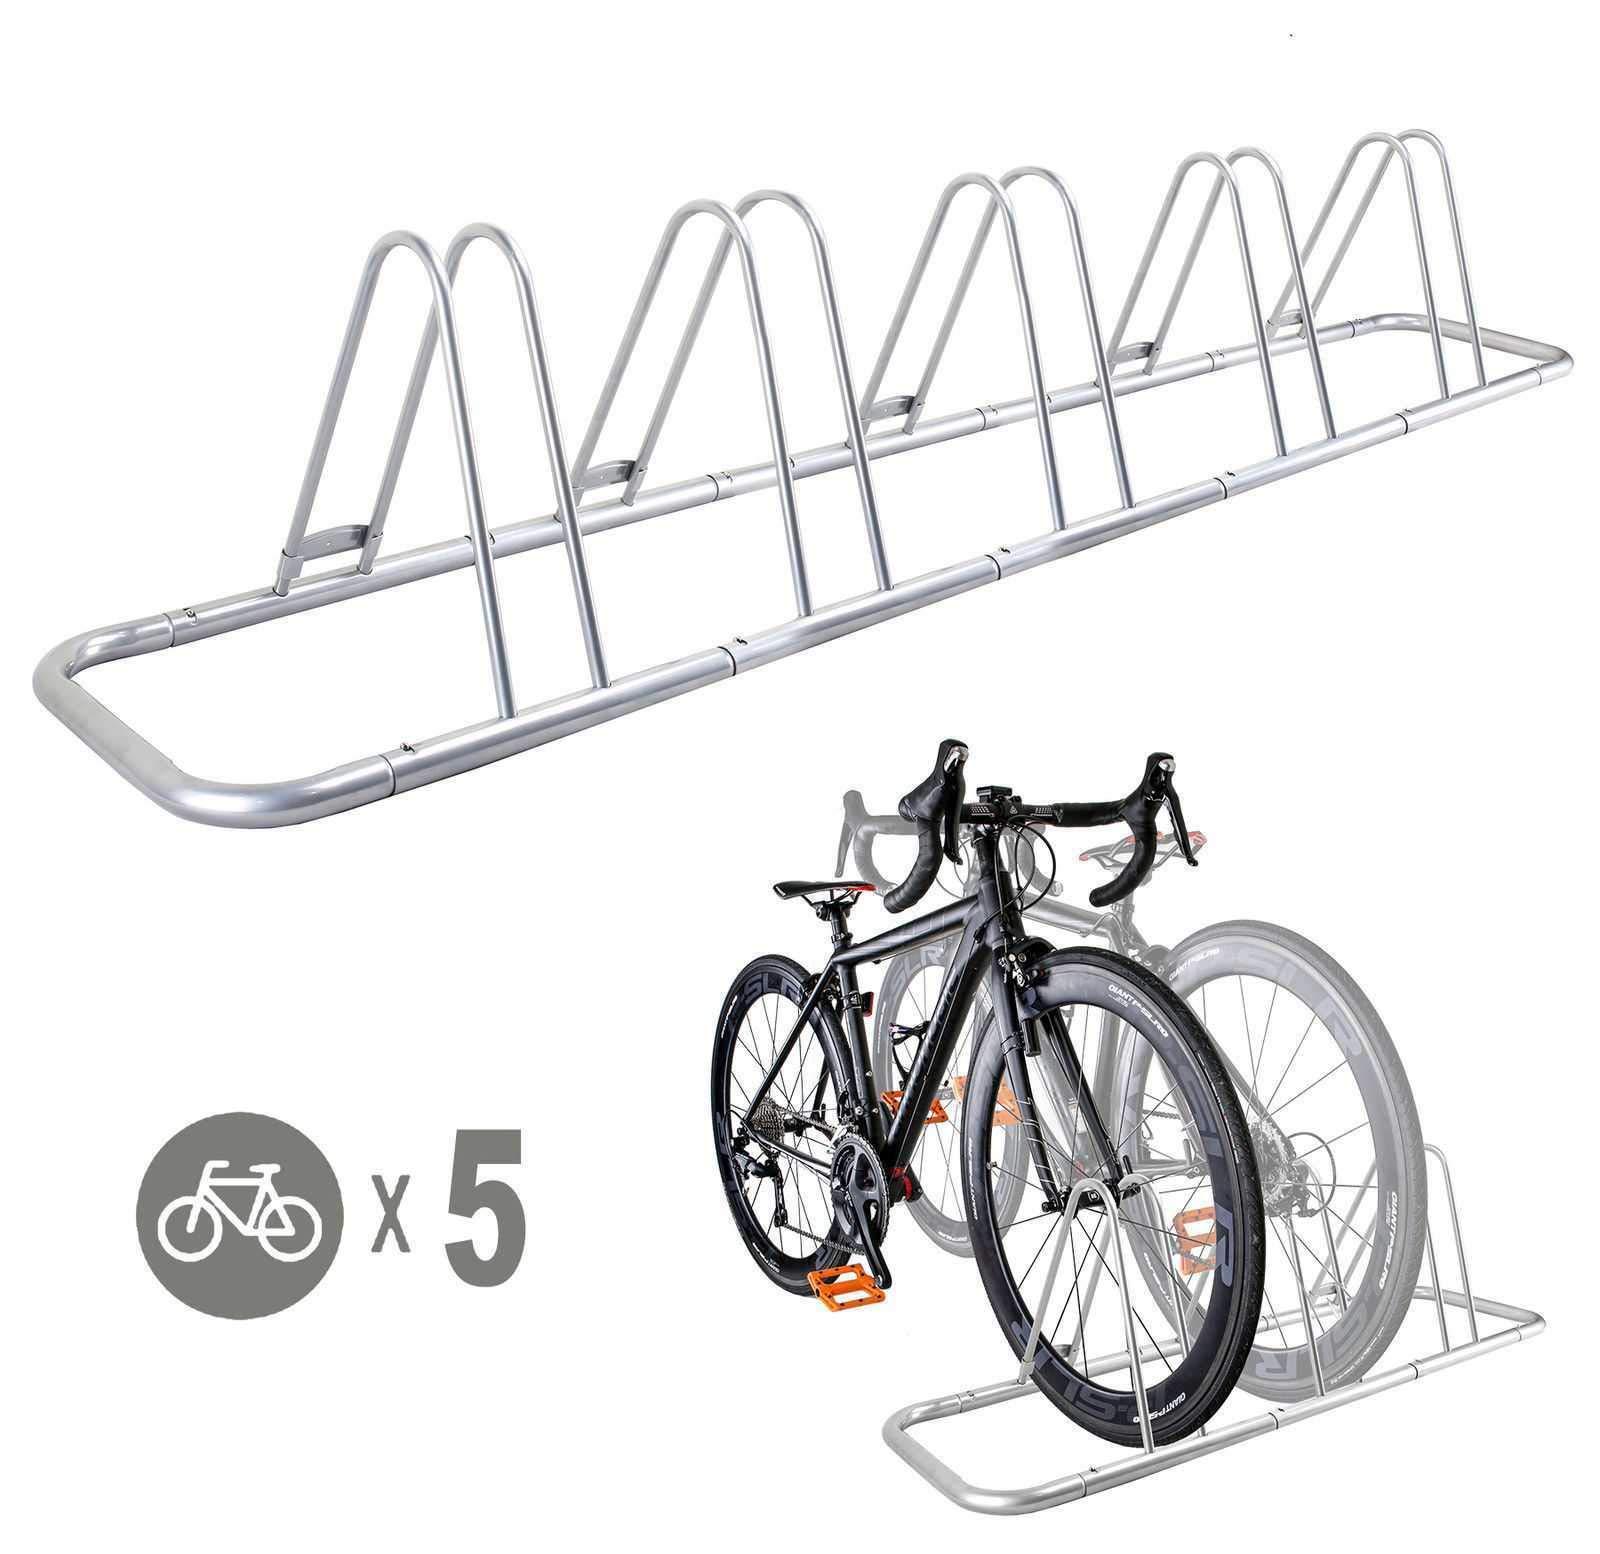 5 Bike Bicycle Floor Parking Rack Storage Stand by CyclingDeal